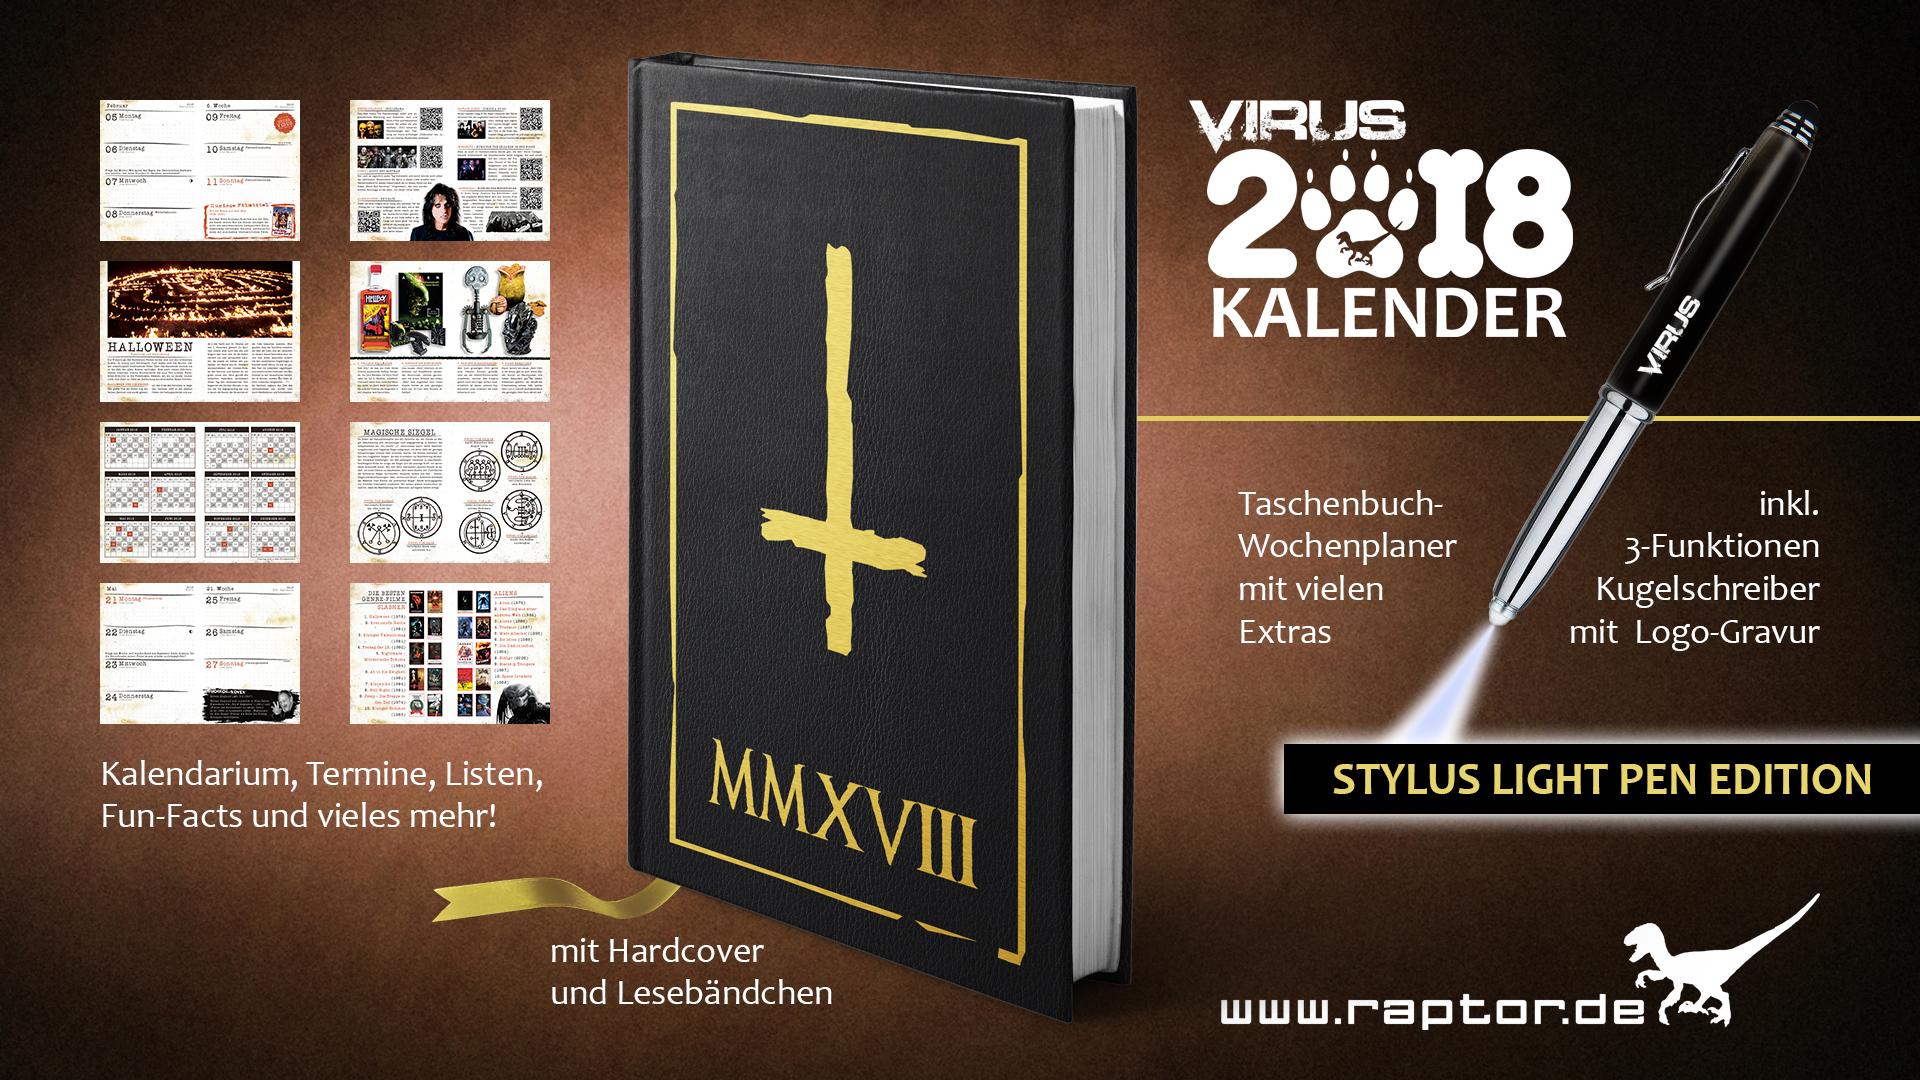 VIRUS Kalender 2018 Stylus Light Pen Edition